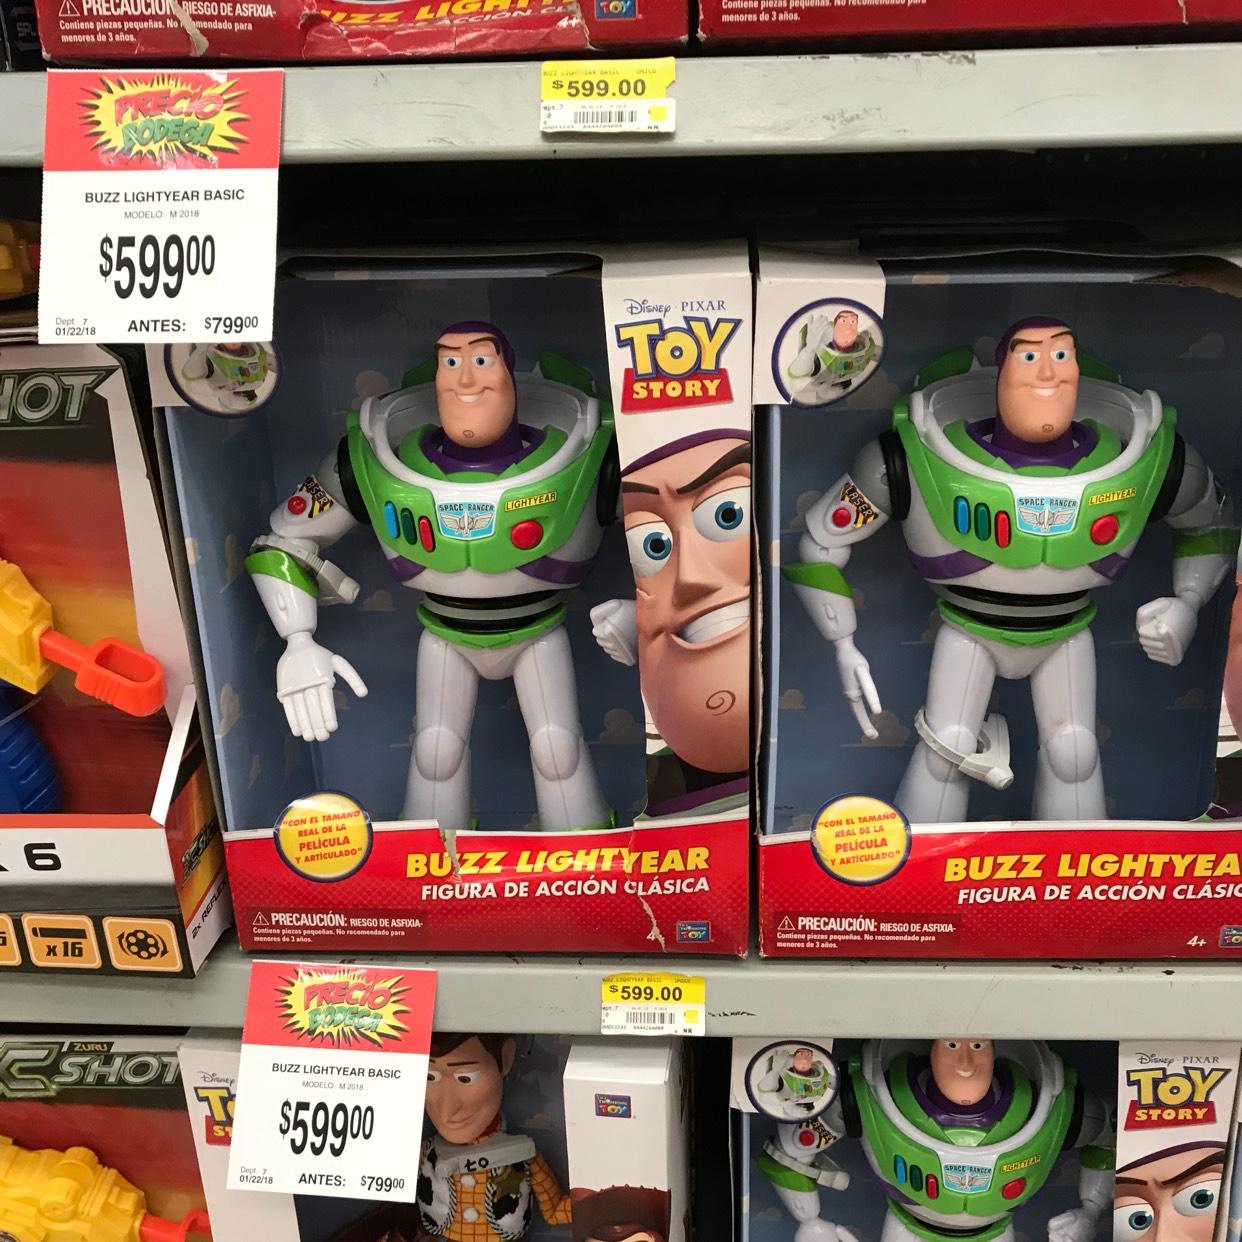 Bodega Aurrerá: Buzz Lightyear a $599